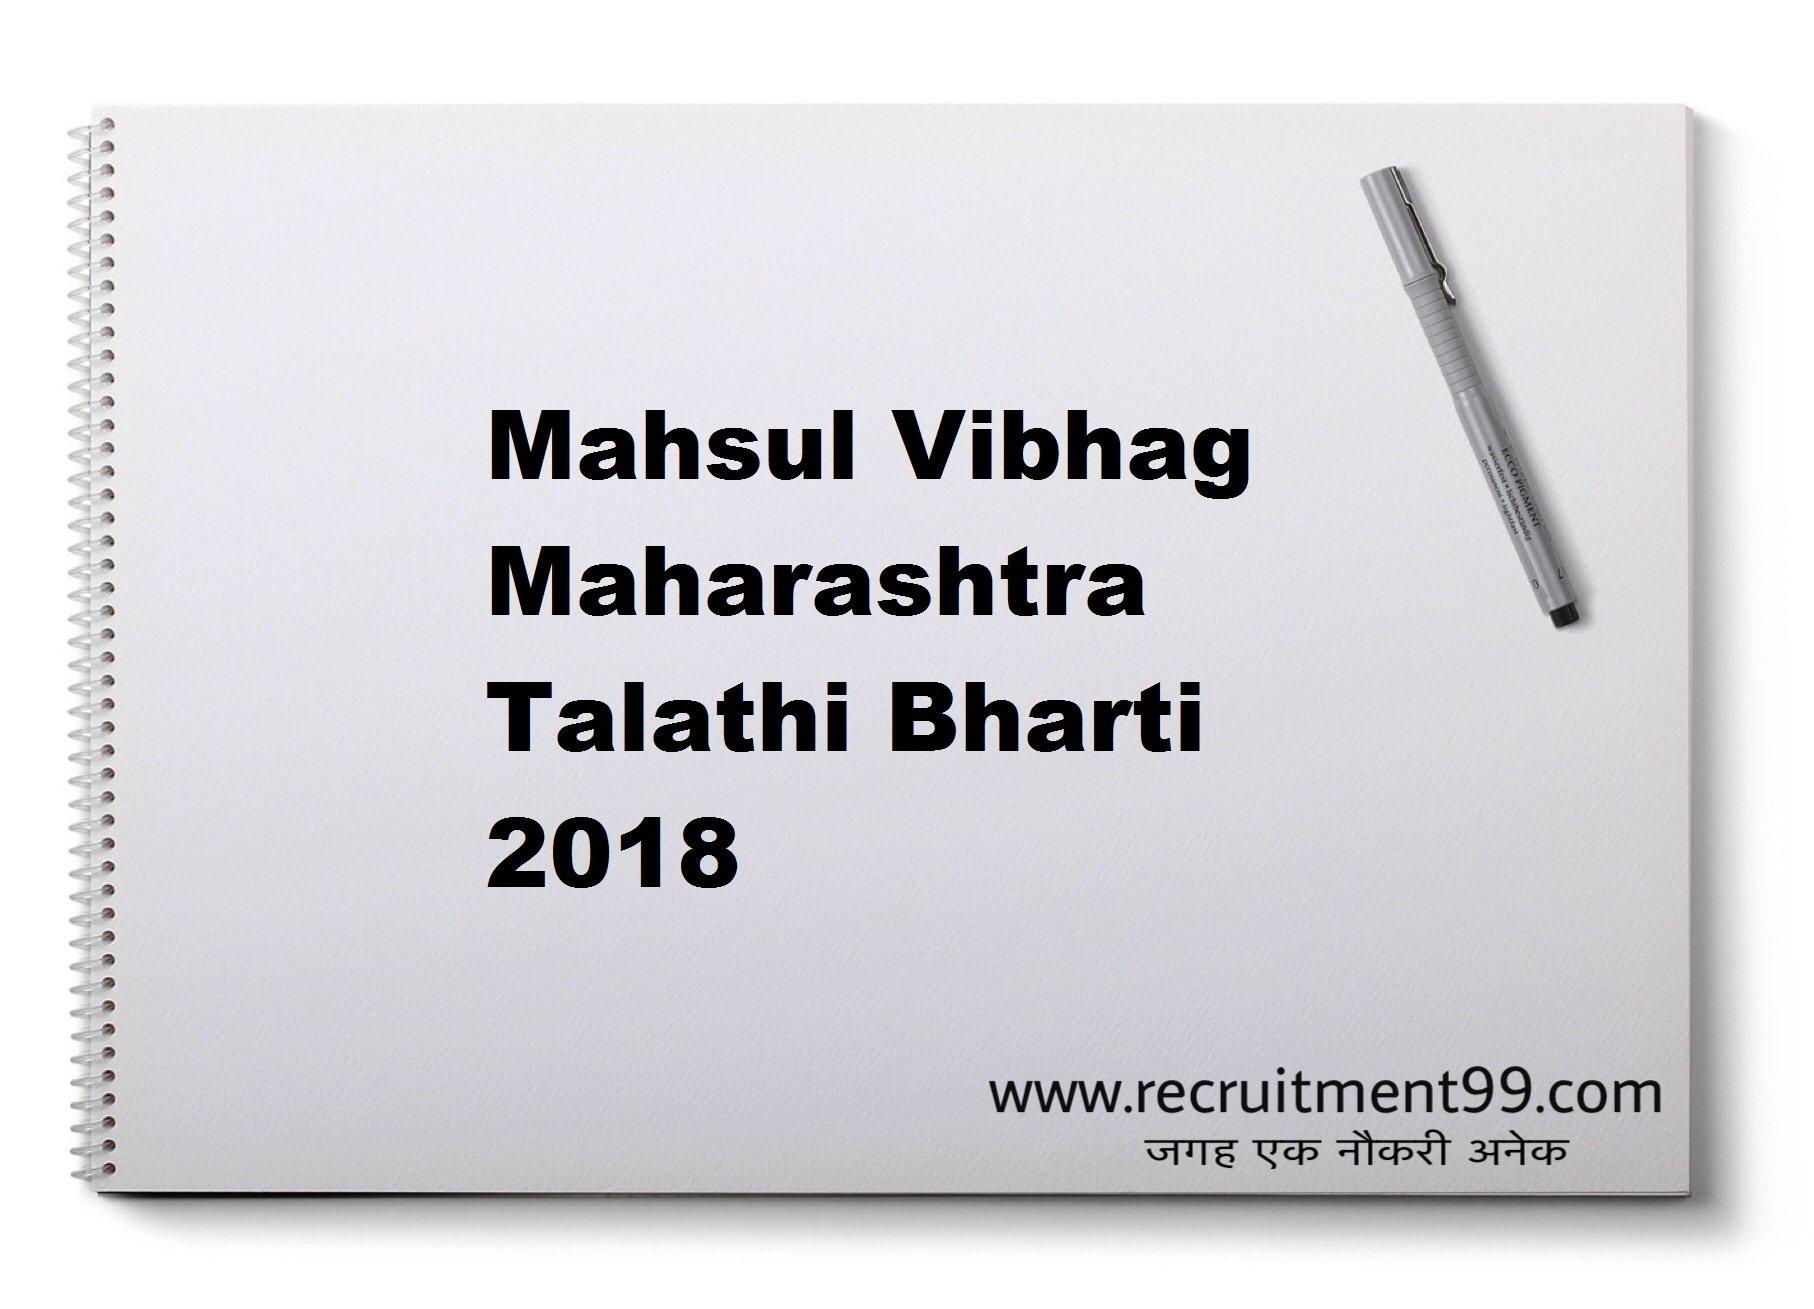 Mahsul Vibhag Maharashtra Talathi Bharti Admit Card Result 2018